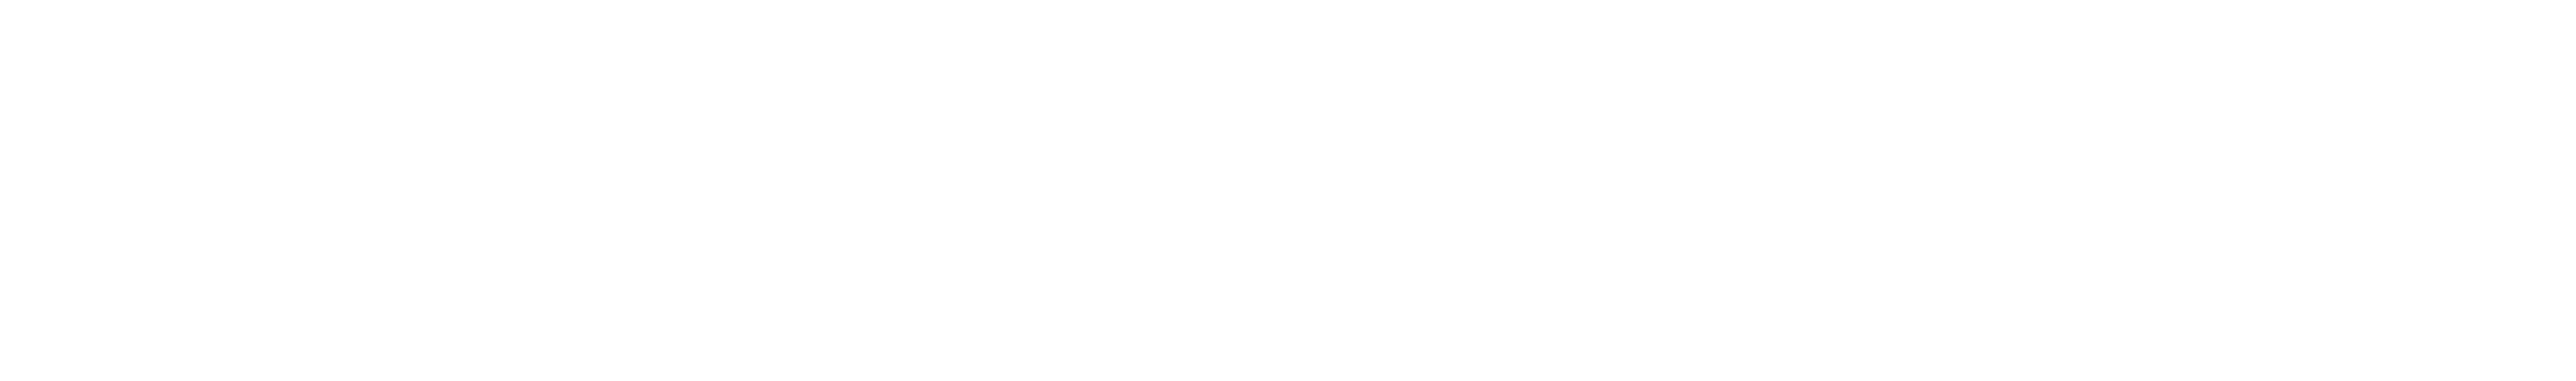 tdo_logo_tag_horiz_white